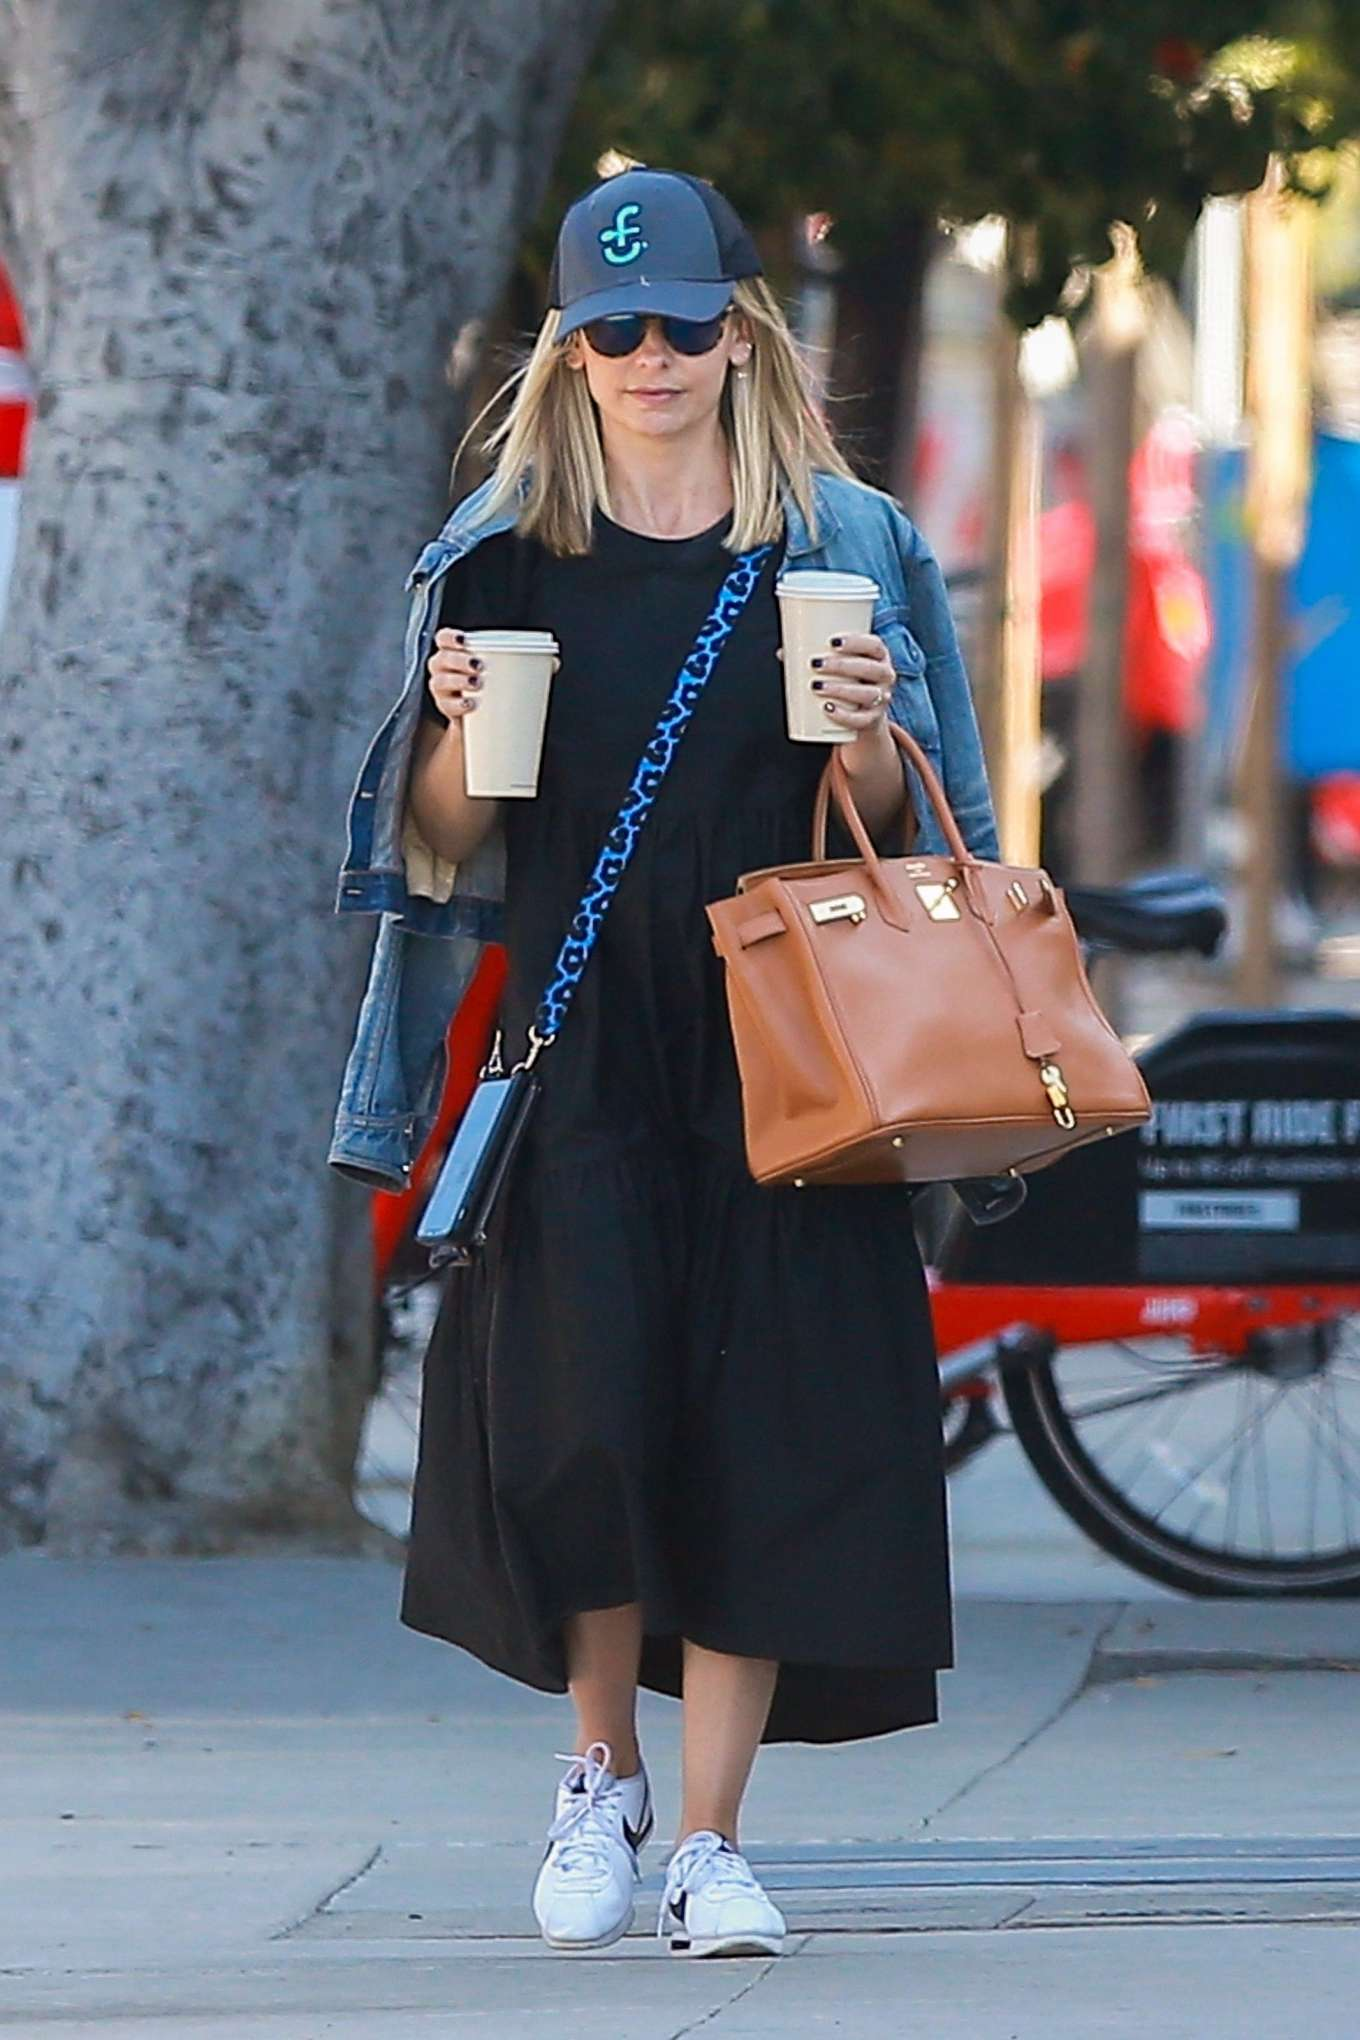 Sarah Michelle Gellar at Blue Bottle Coffee in Santa Monica